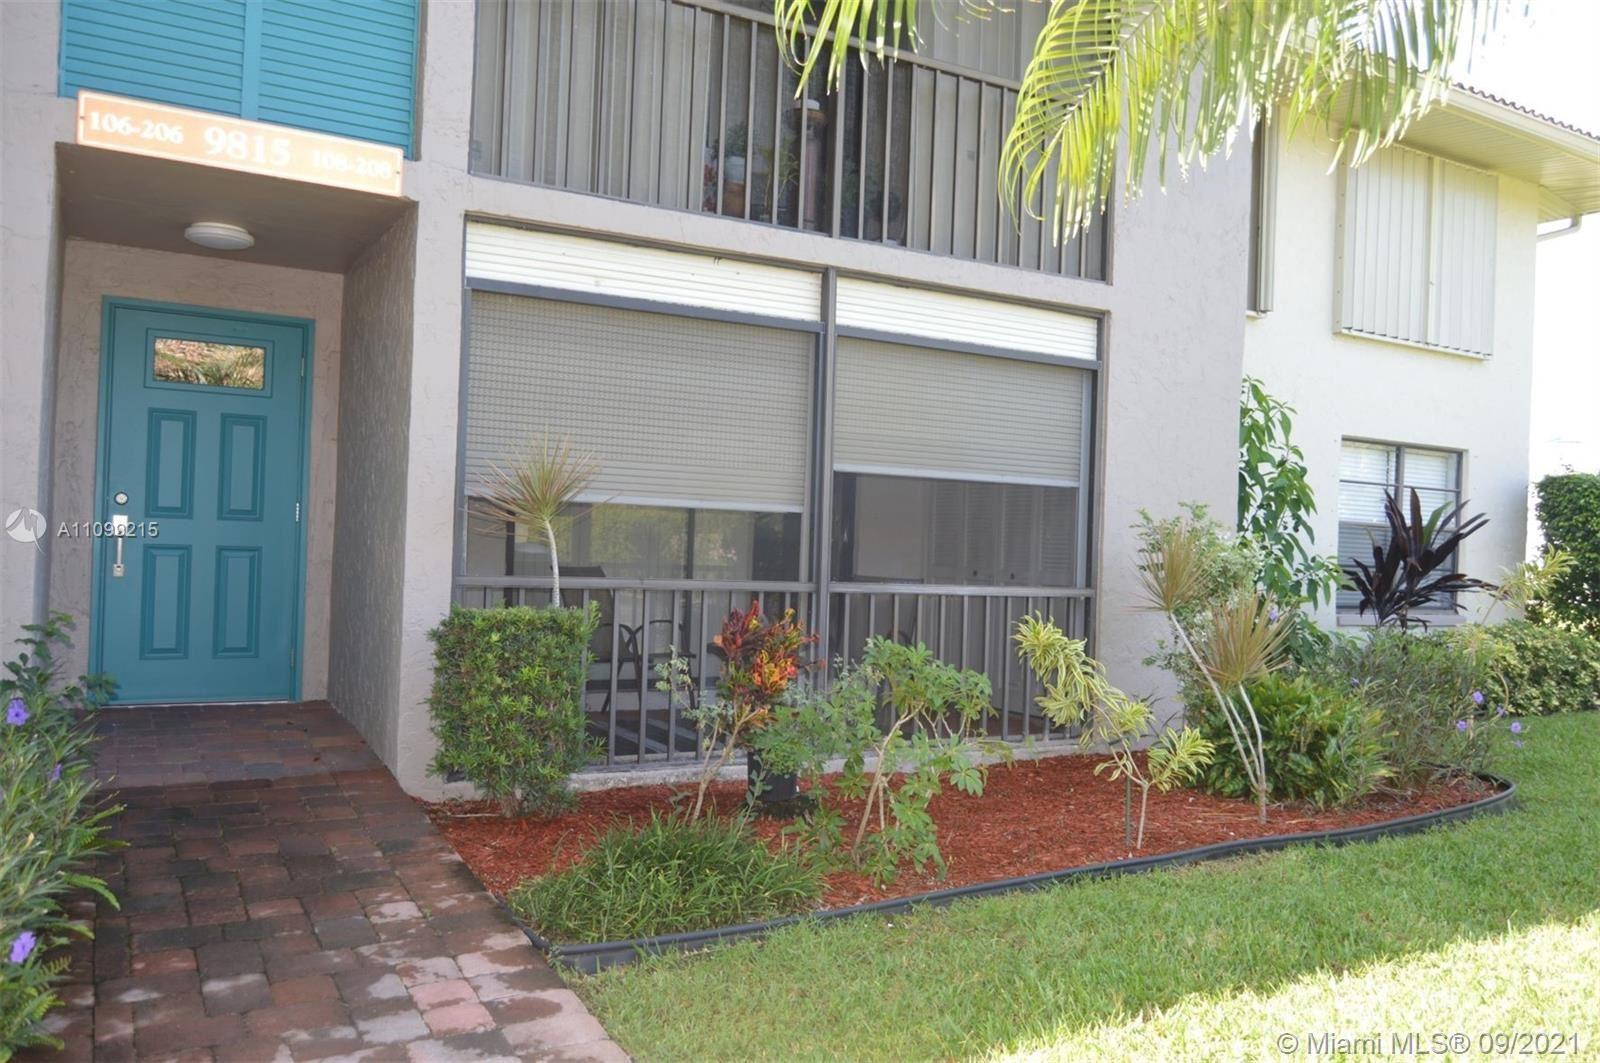 9815 Pineapple Tree Dr #108, Boynton Beach, FL 33436 - #: A11099215